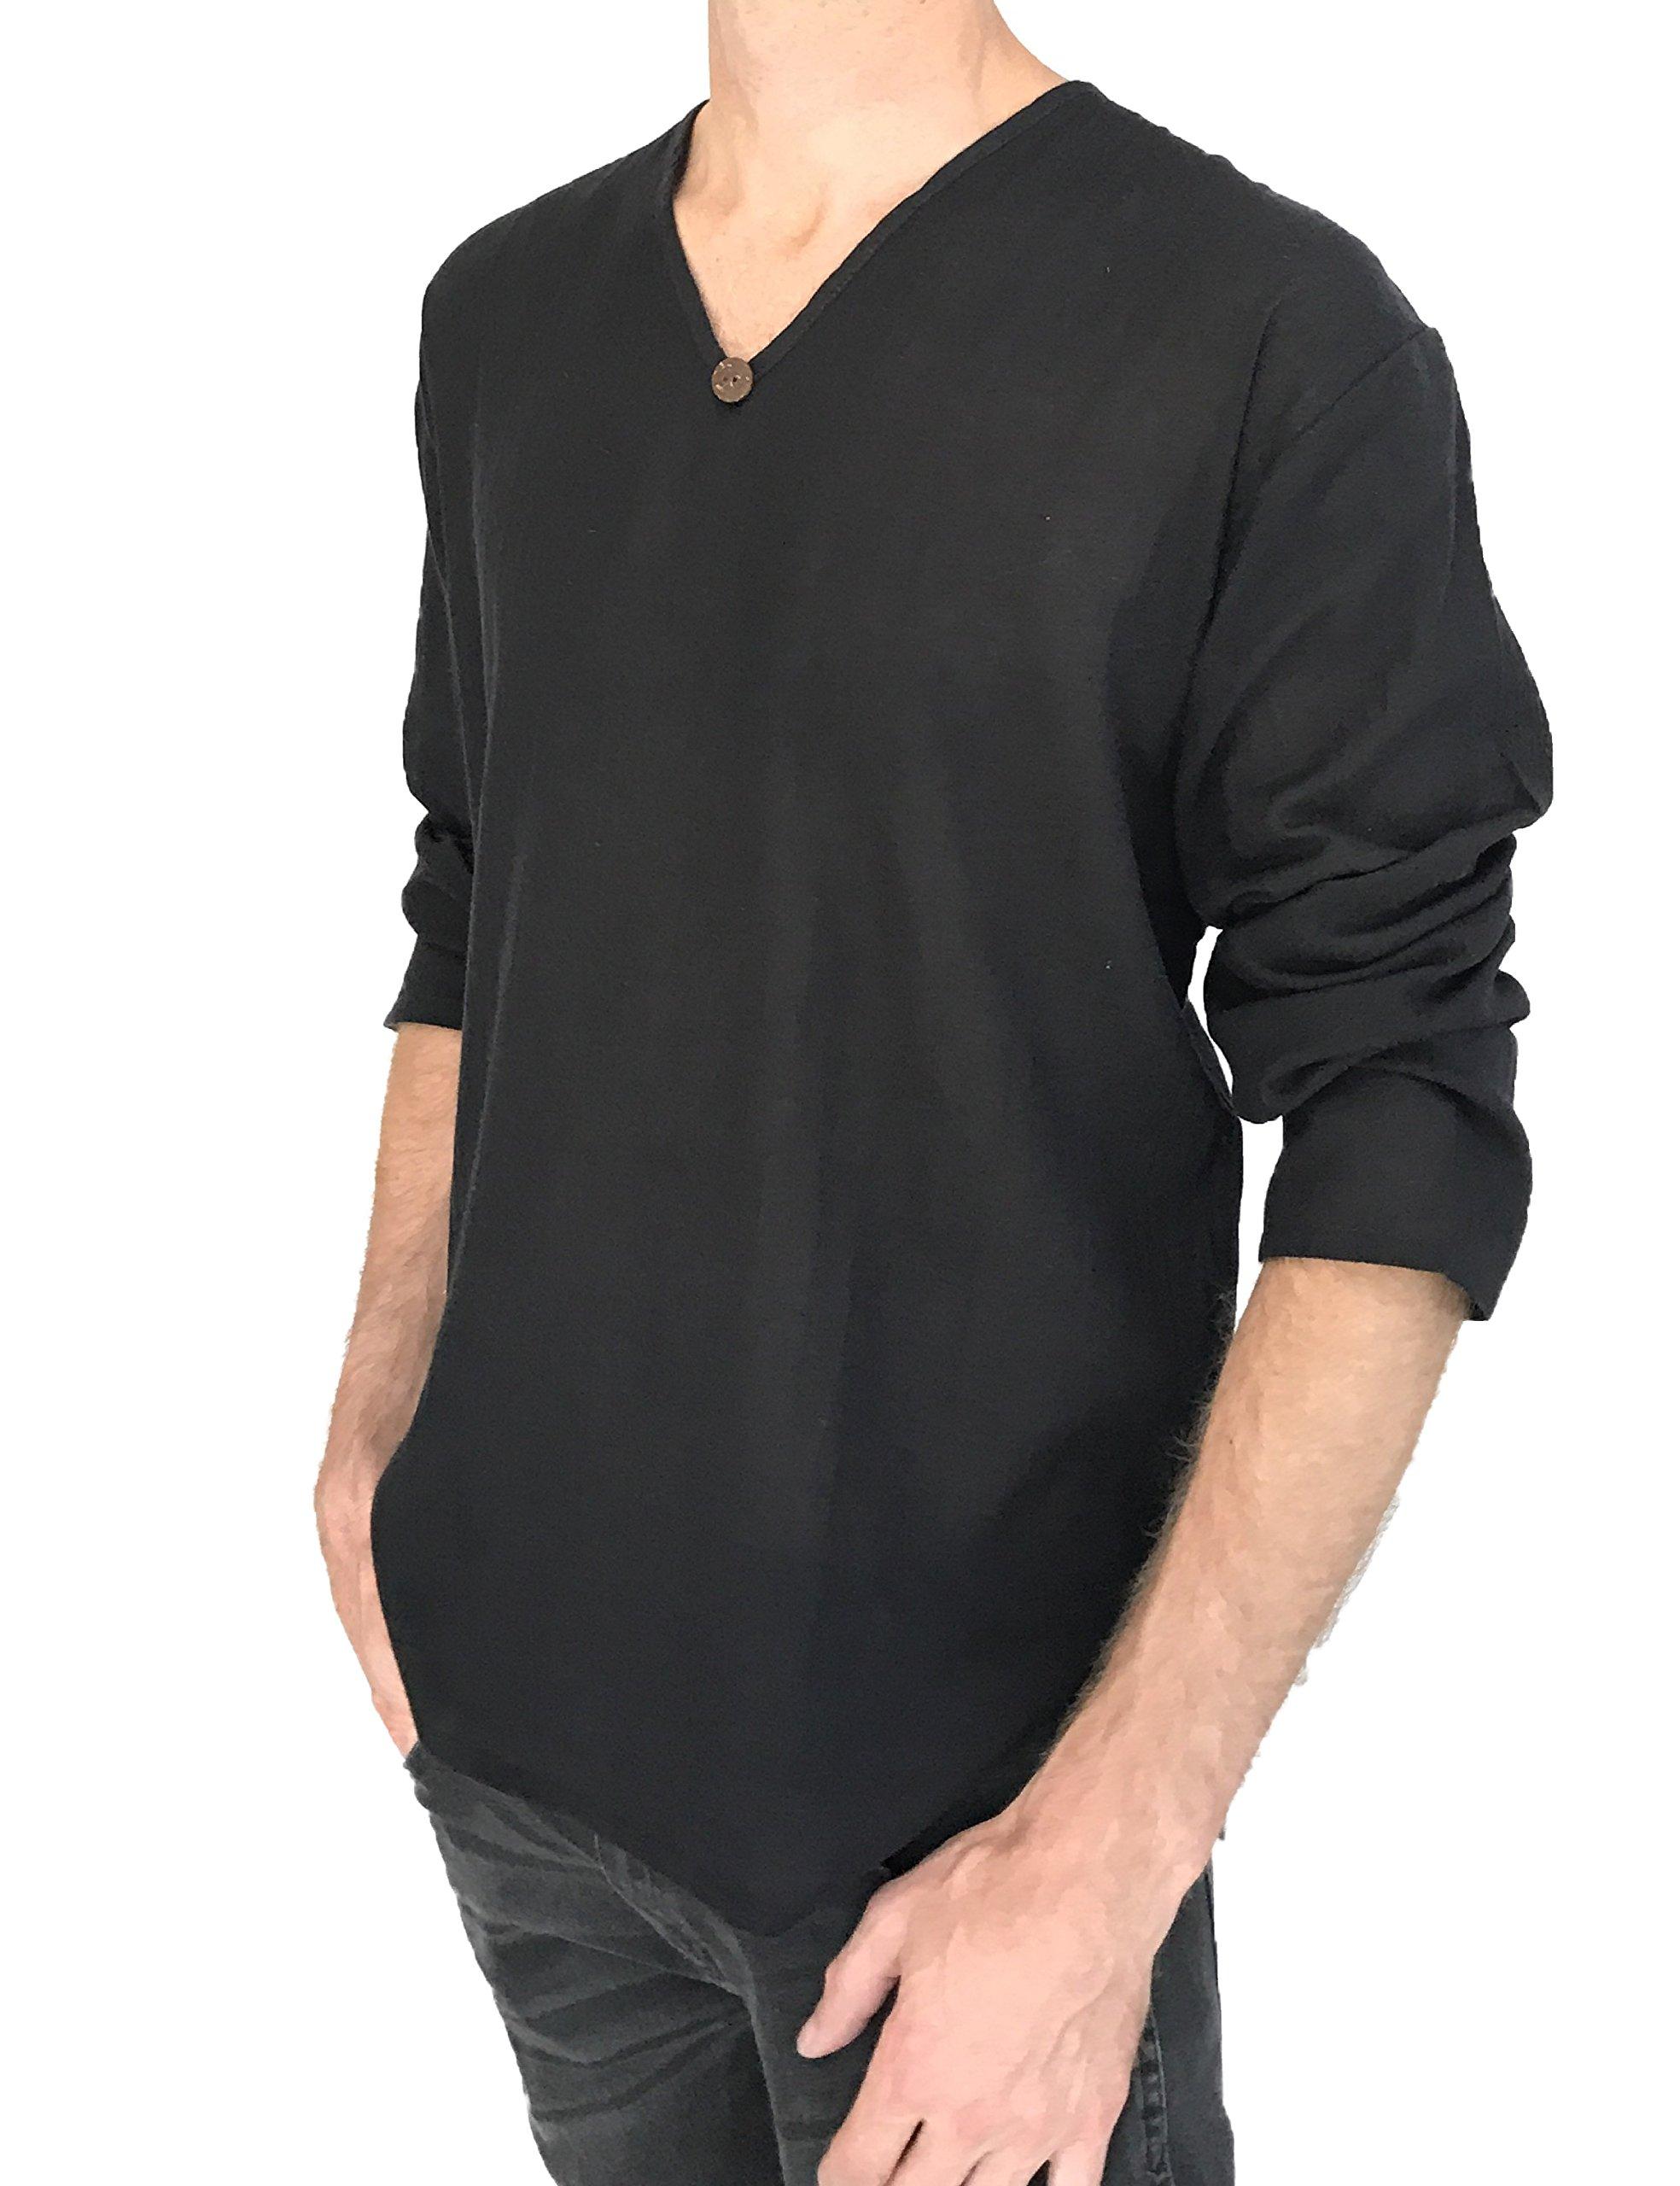 Love Quality Men's T-Shirt 100% Cotton Hippie Shirt Beach Yoga Top Feature Button (Medium, Black) by Love Quality (Image #1)